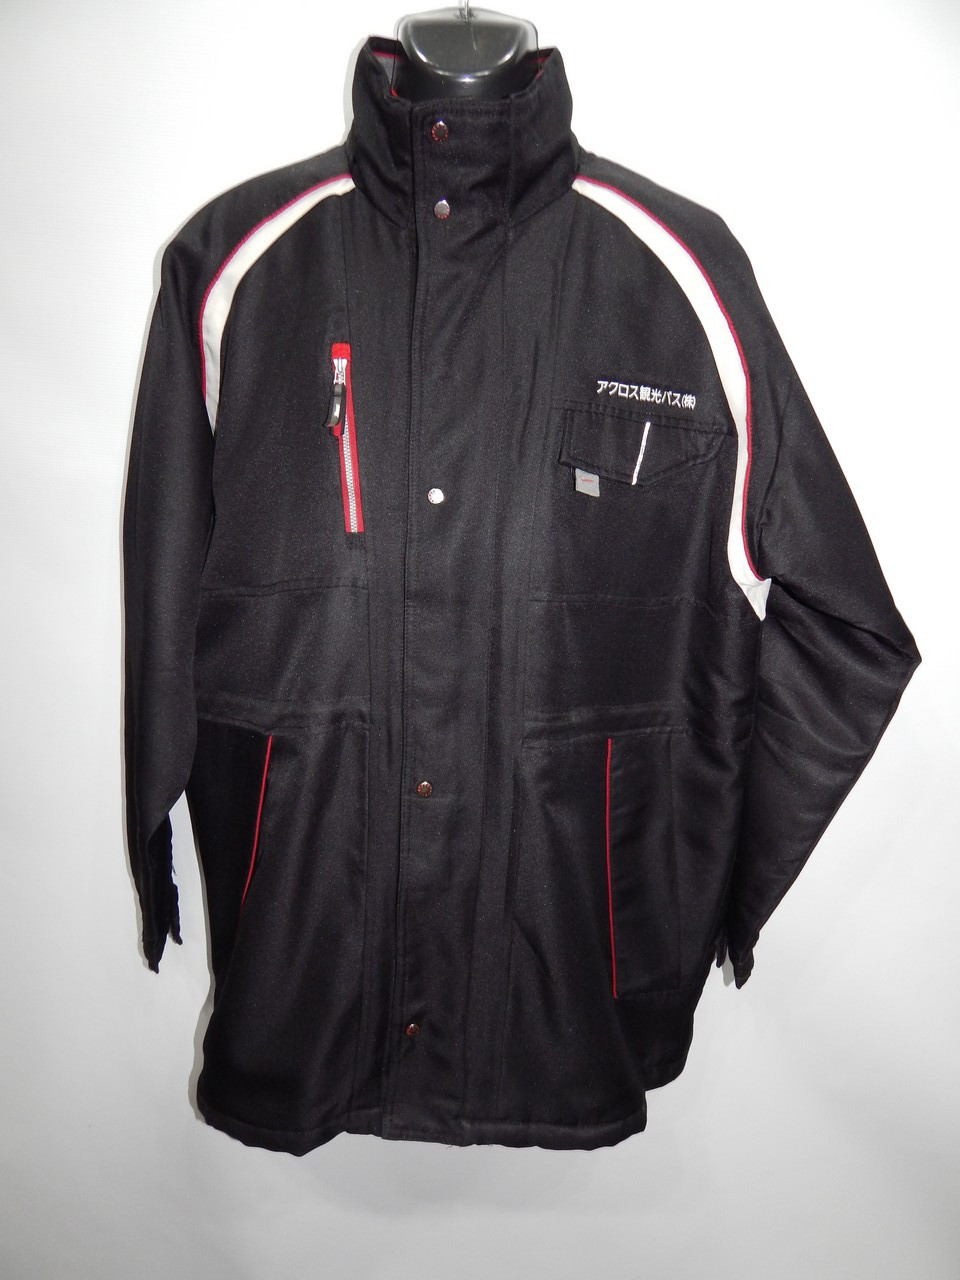 Мужская демисезонная спортивная куртка на синтепоне Xebek р.58 261KMD (батал)